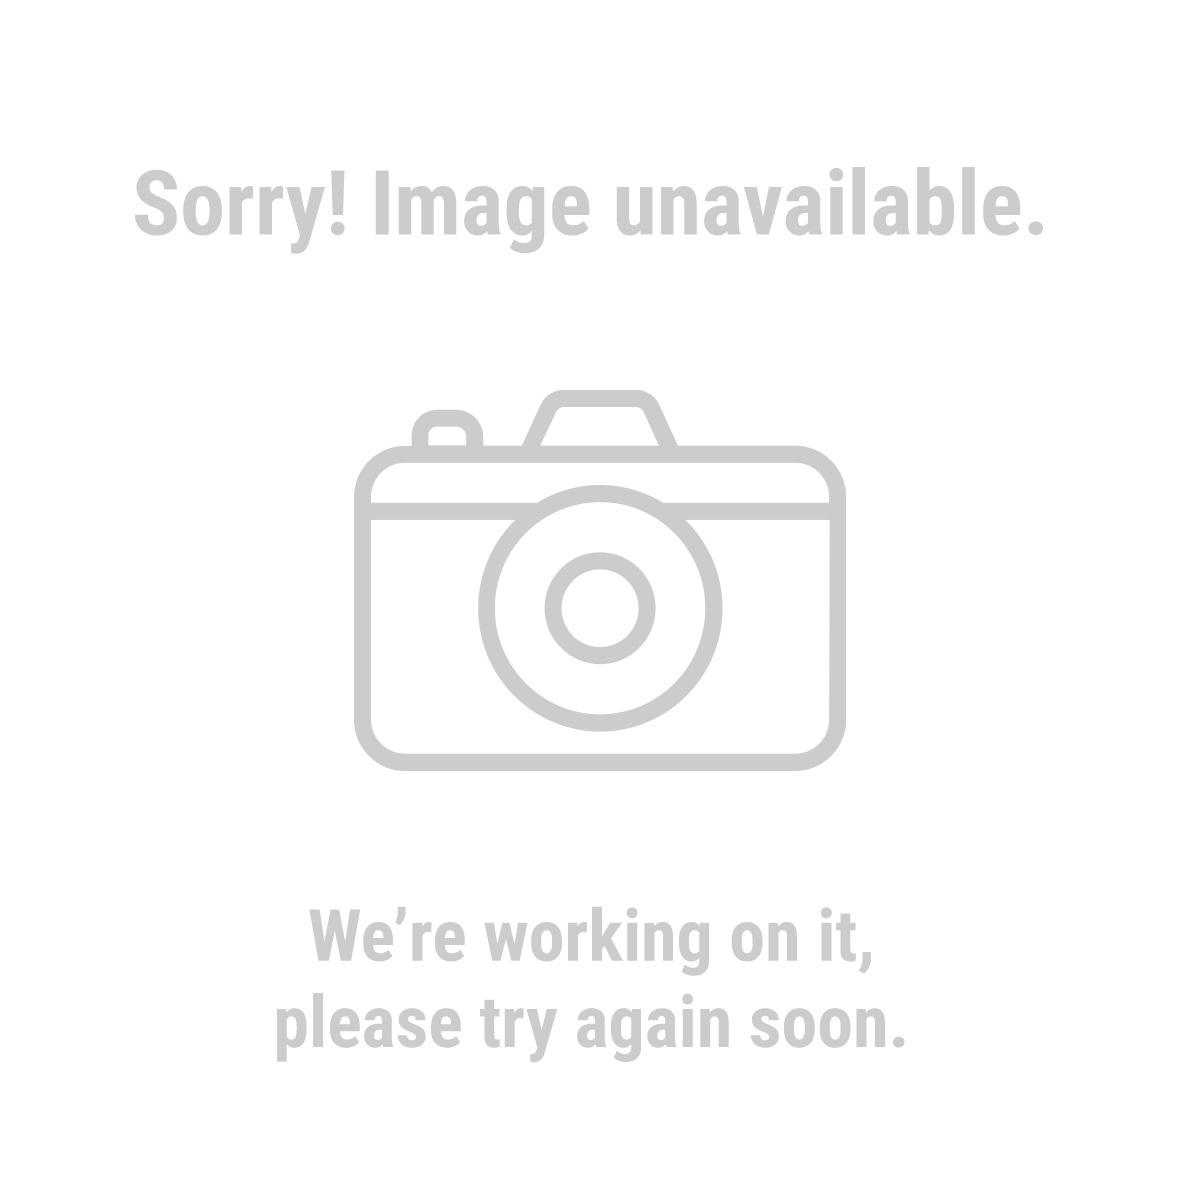 Amazing 3 Ton Steel Heavy Duty Floor Jack With Rapid ...